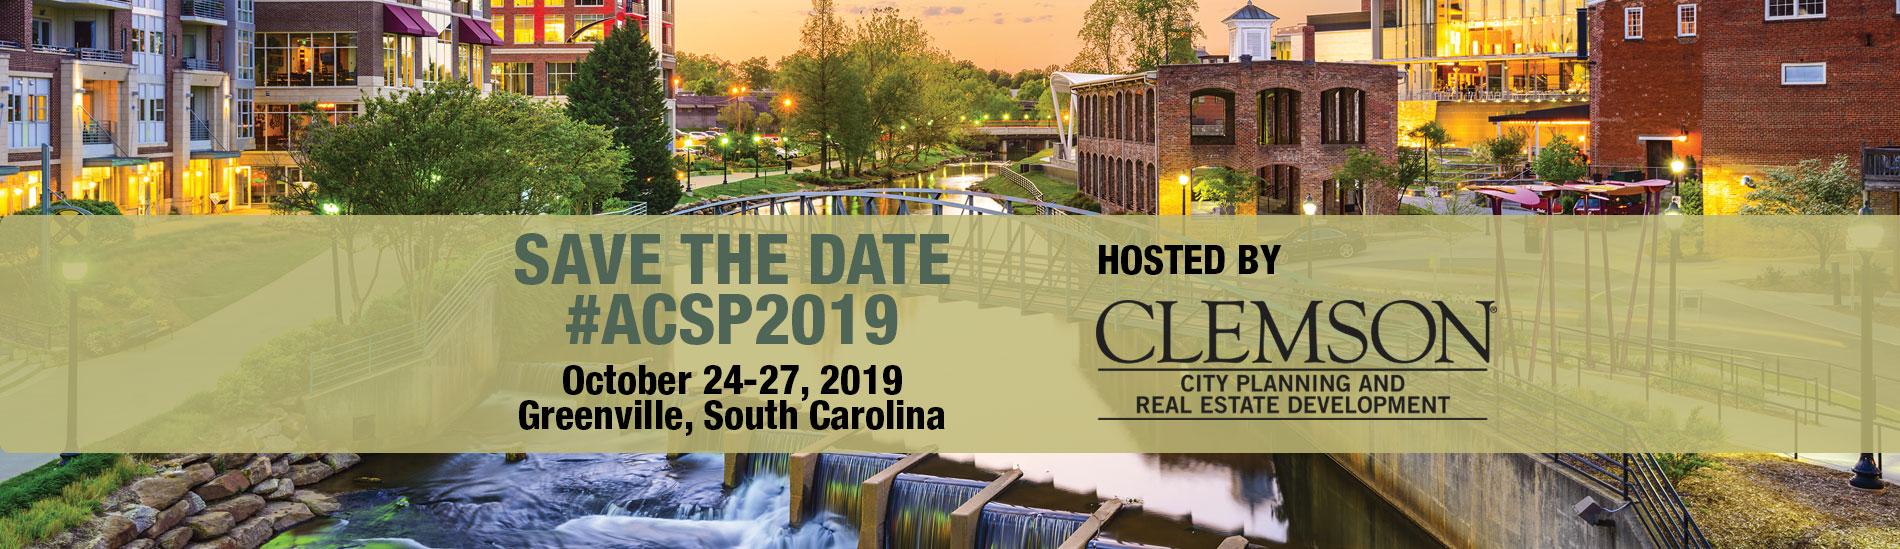 2019 Attendee Registration - Association of Collegiate